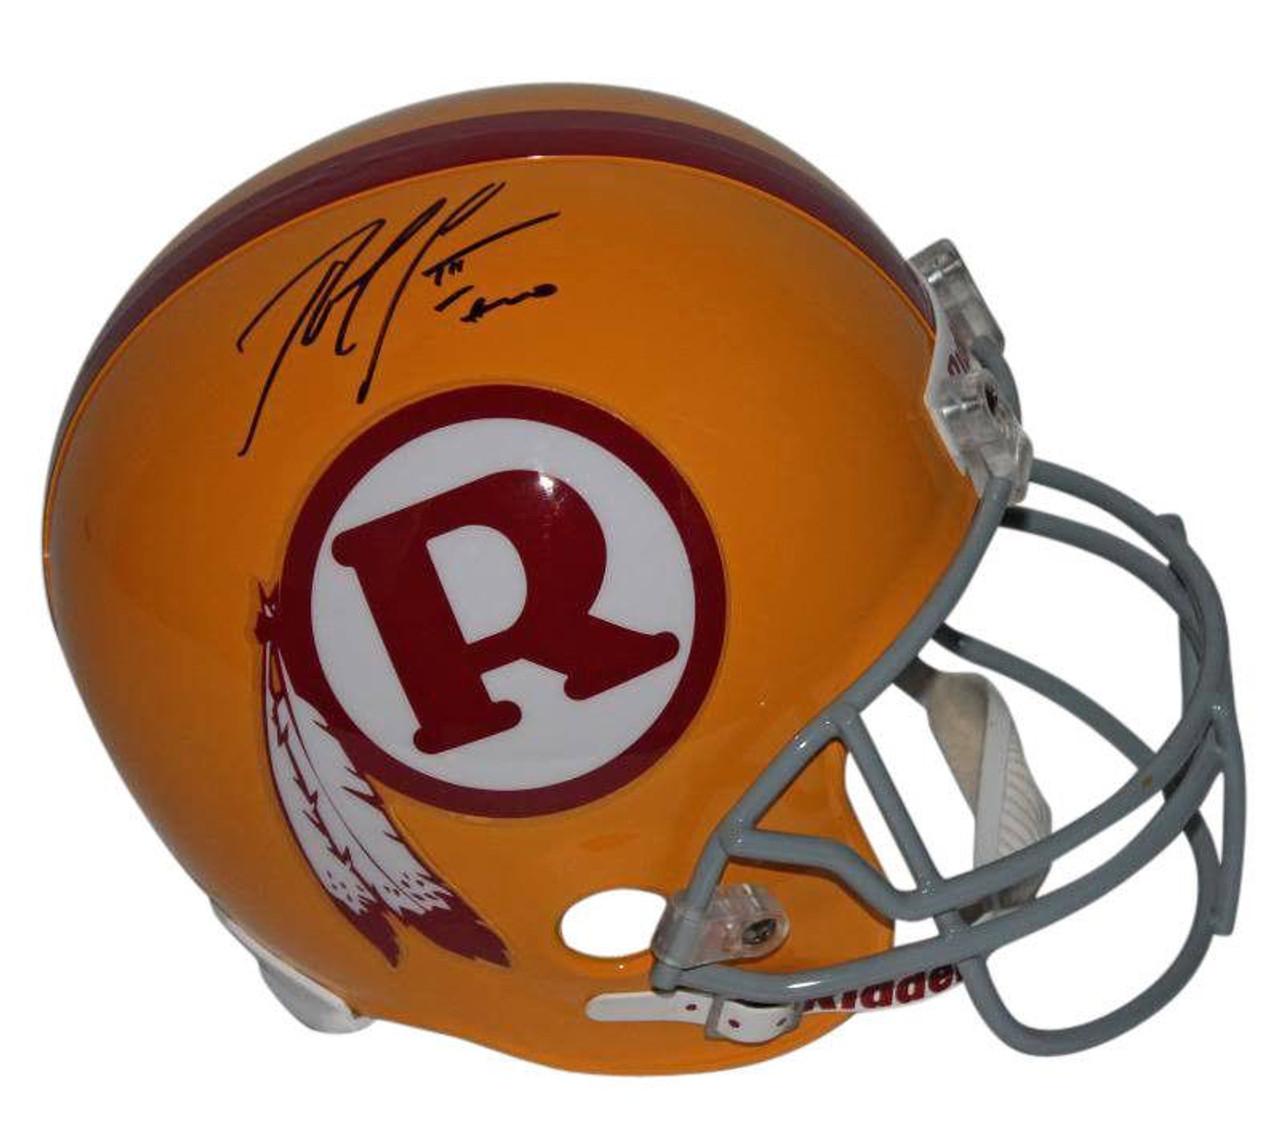 Robert Griffin III (RG3) Washington Redskins Autographed Retro Full Size  Replica Football Helmet 34358a046